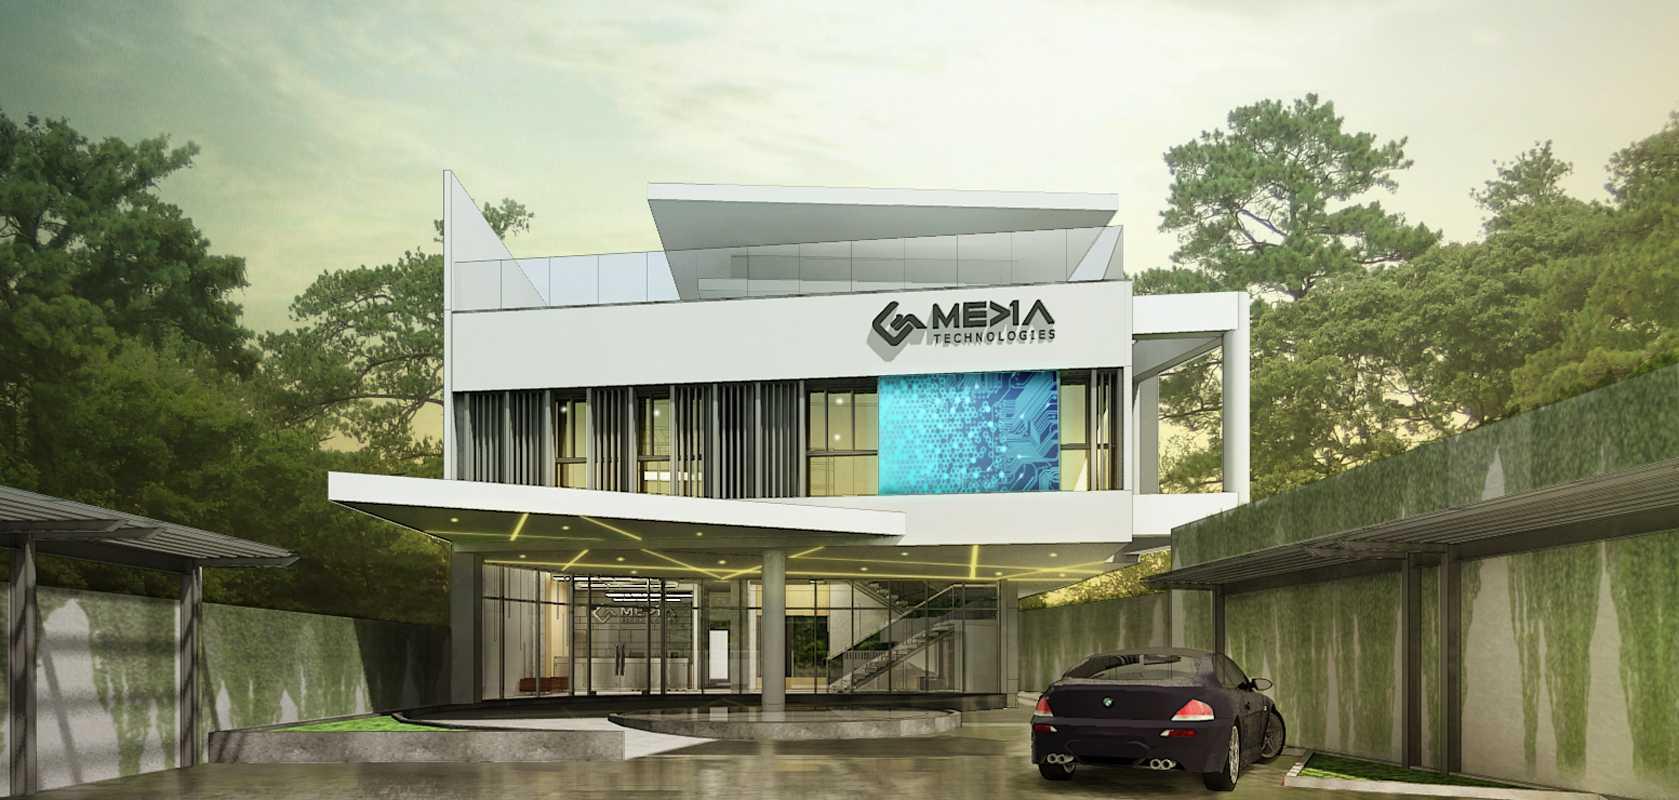 Rerupa Architecture G-Media Office Sleman, Yogyakarta, Indonesia Sleman, Yogyakarta, Indonesia Front View Kontemporer  28950